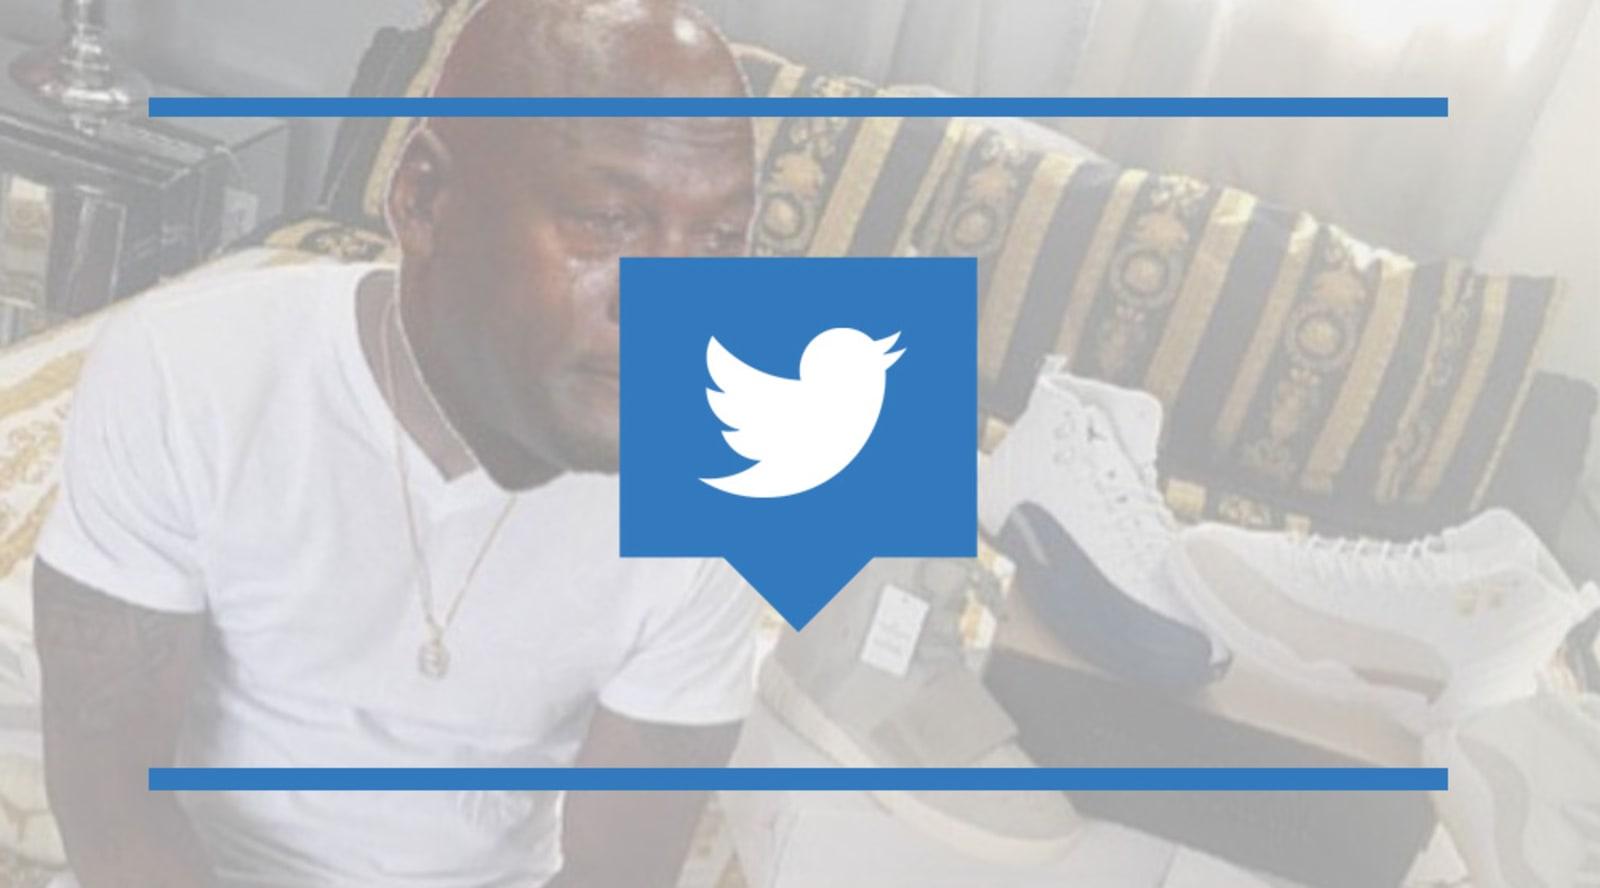 b1b2e325e575 Damn Daniel Illuminati - The Best of Sneaker Twitter March 6